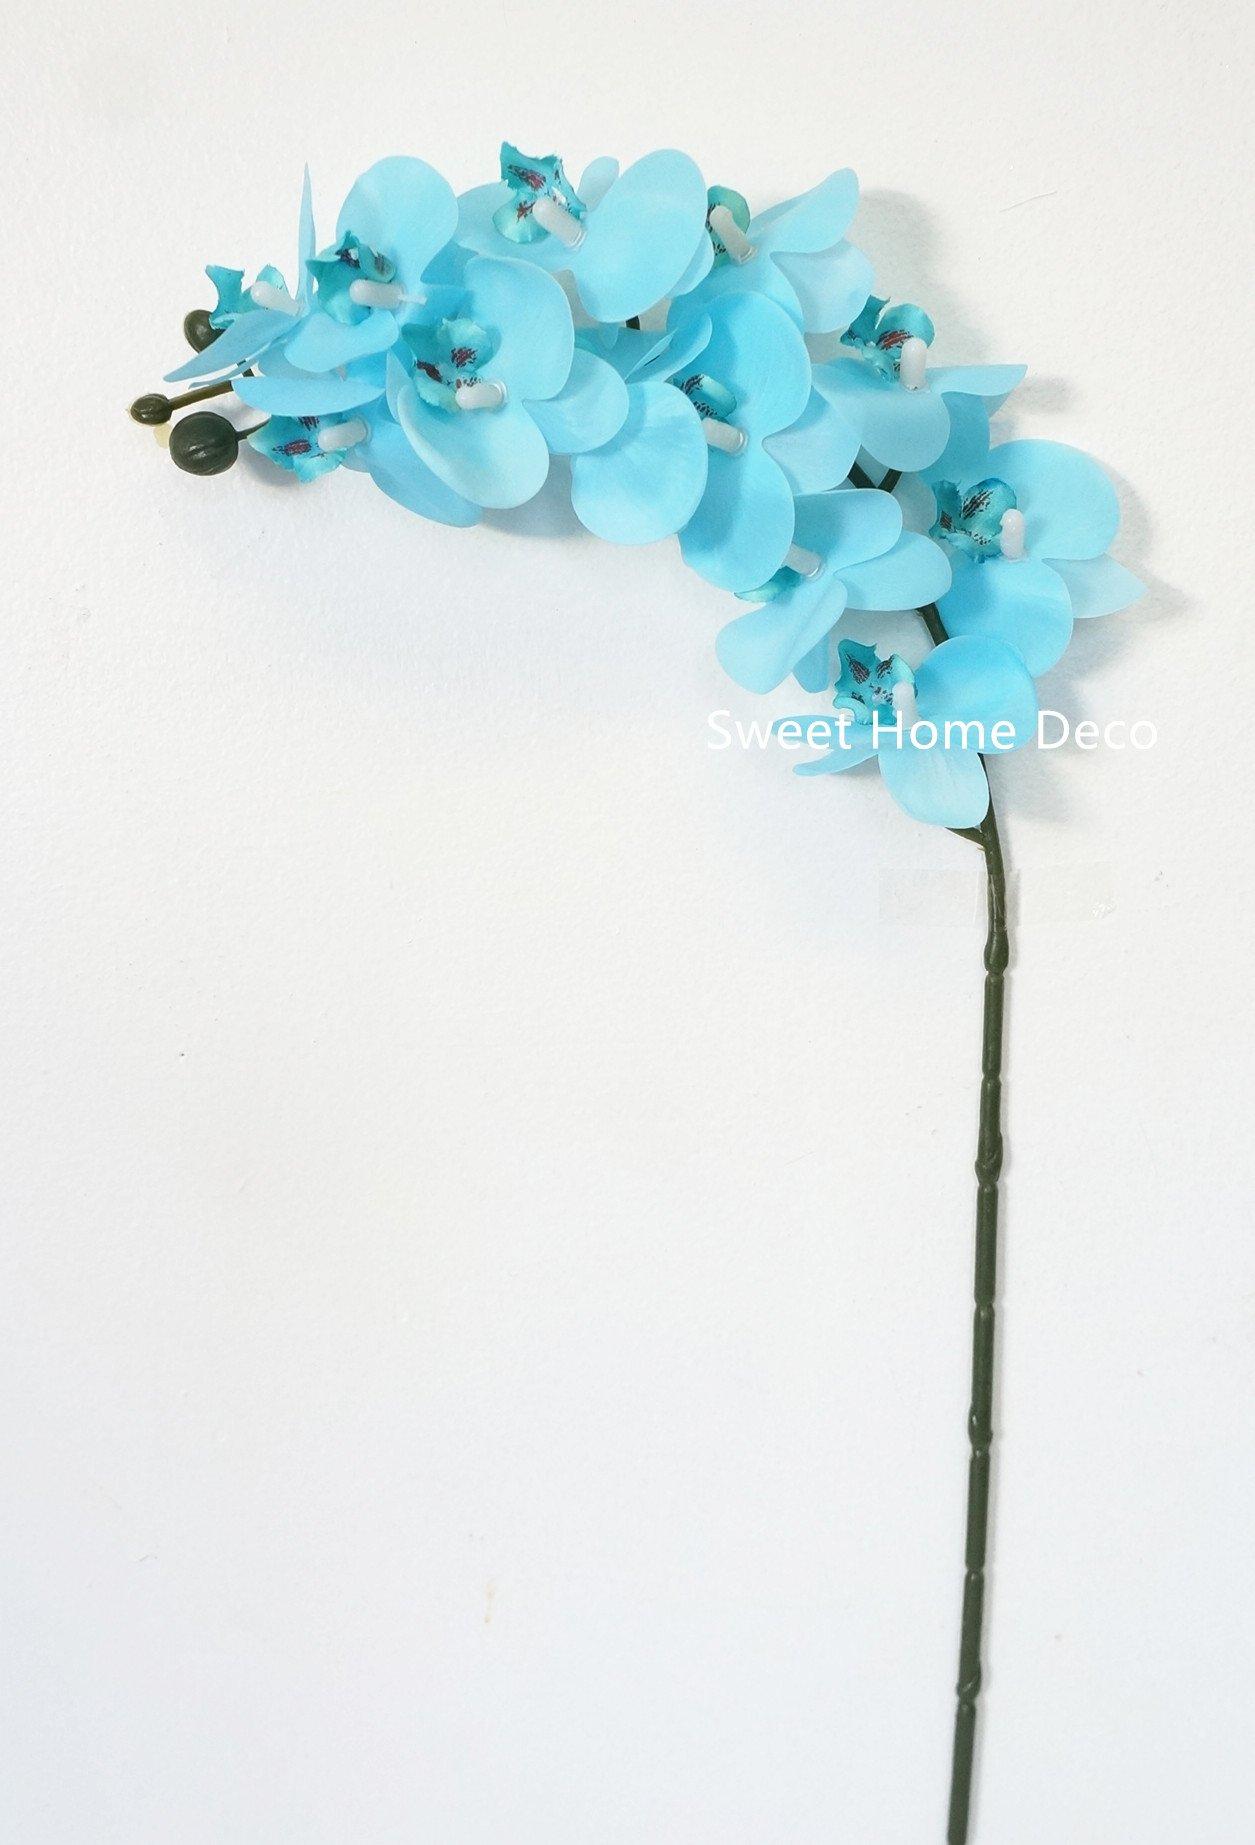 silk flower arrangements sweet home deco 23'' mini latex real touch phanaenopsis orchid spray (12 flower heads) (2, light blue)